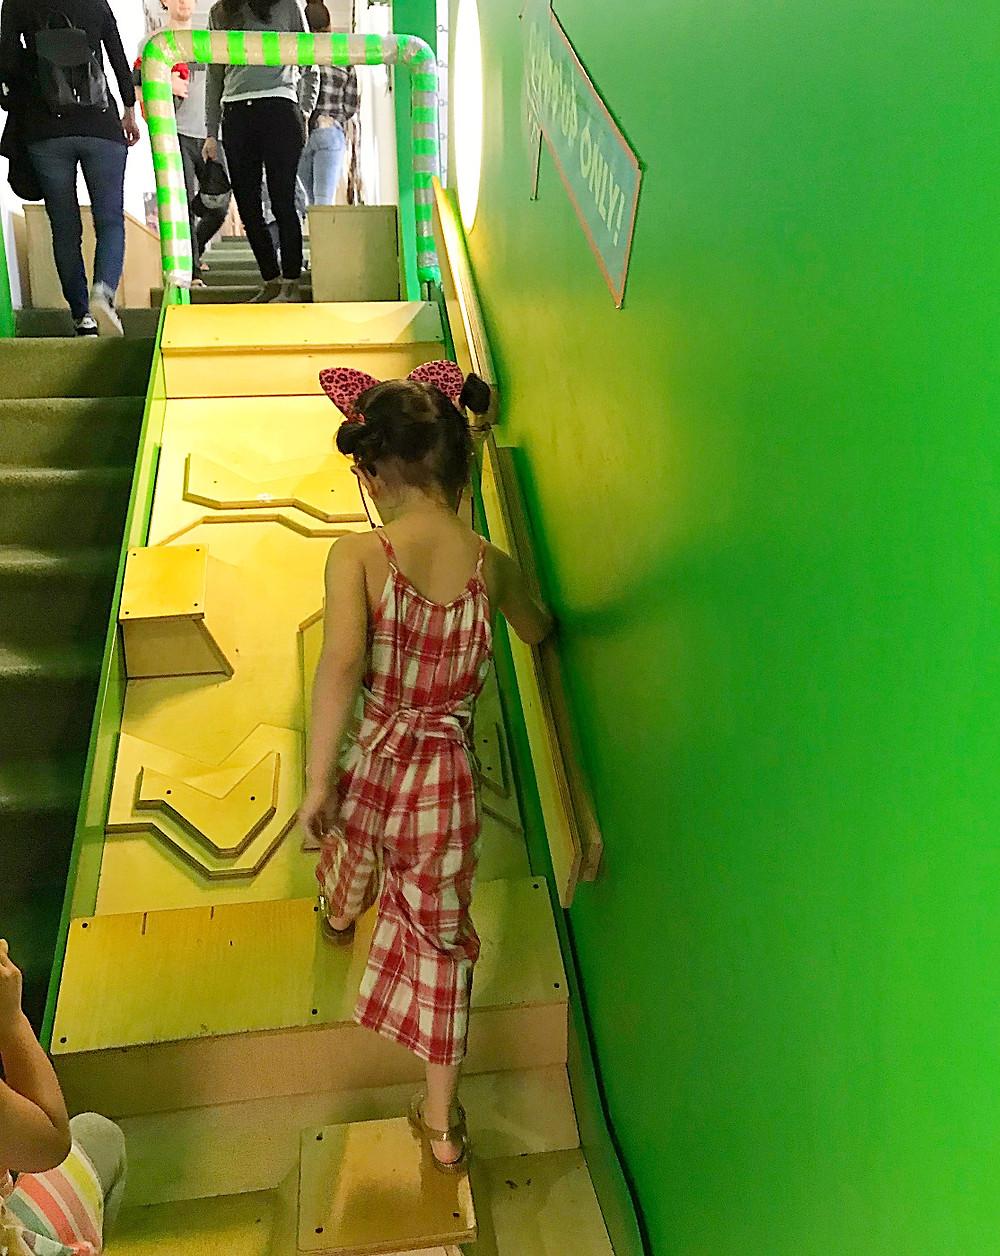 children's museum of the arts, children's museum, art, kids art, creative kids, nyc kids, summer break, nyc summer, mom blogger, children's playspace, swirl studio